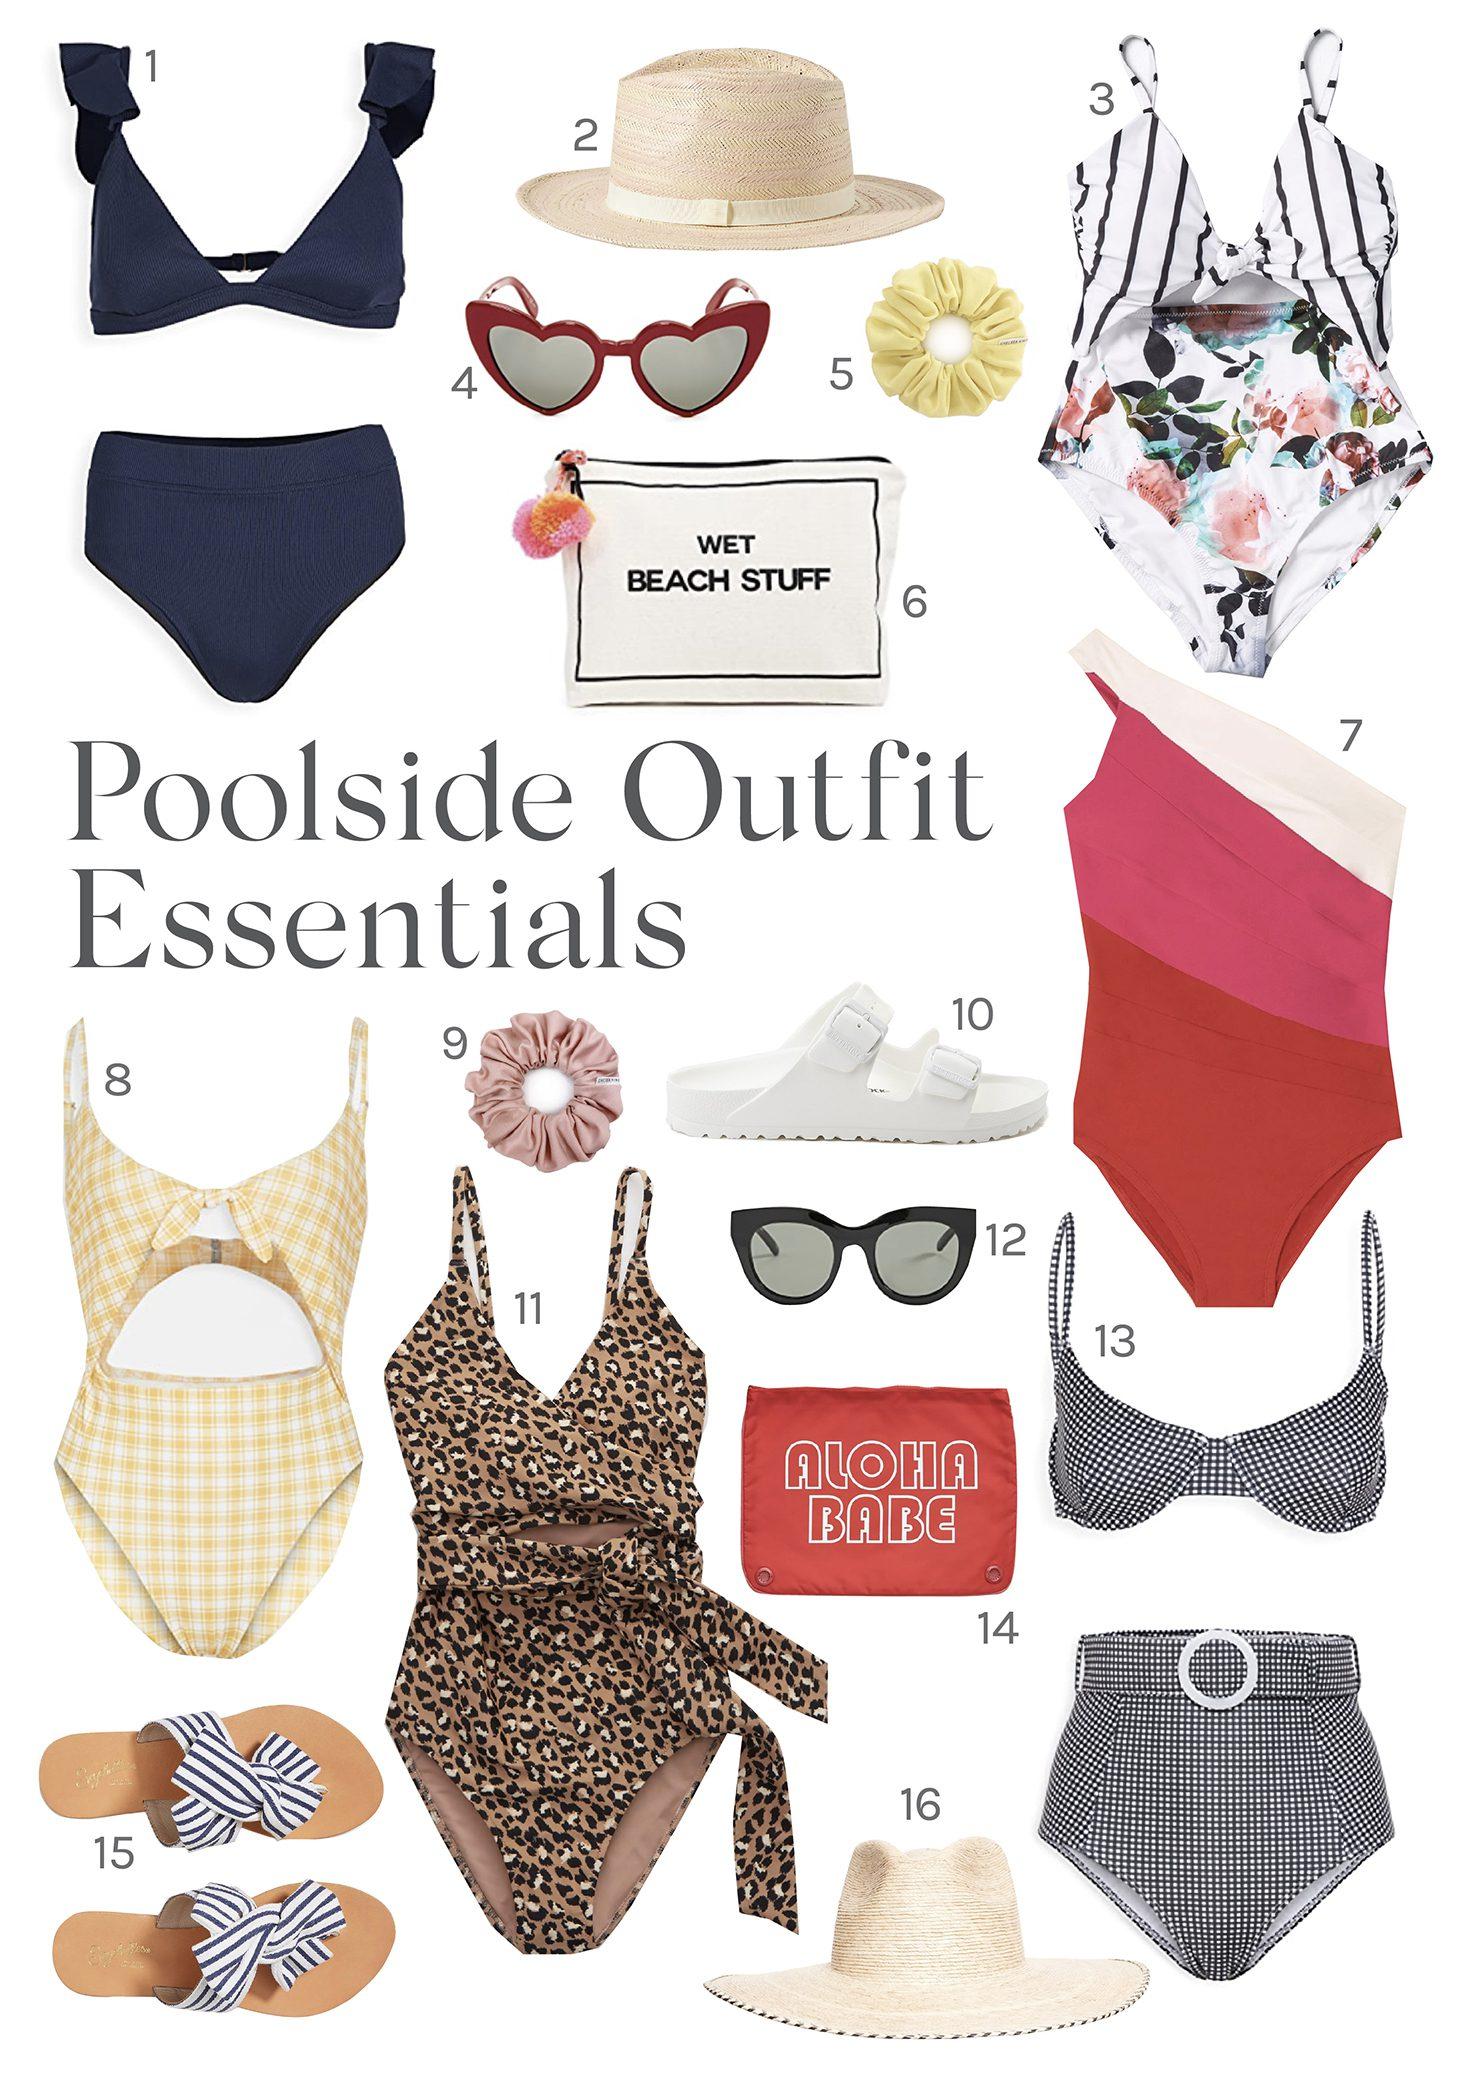 Bestselling Bathing Suits 2020